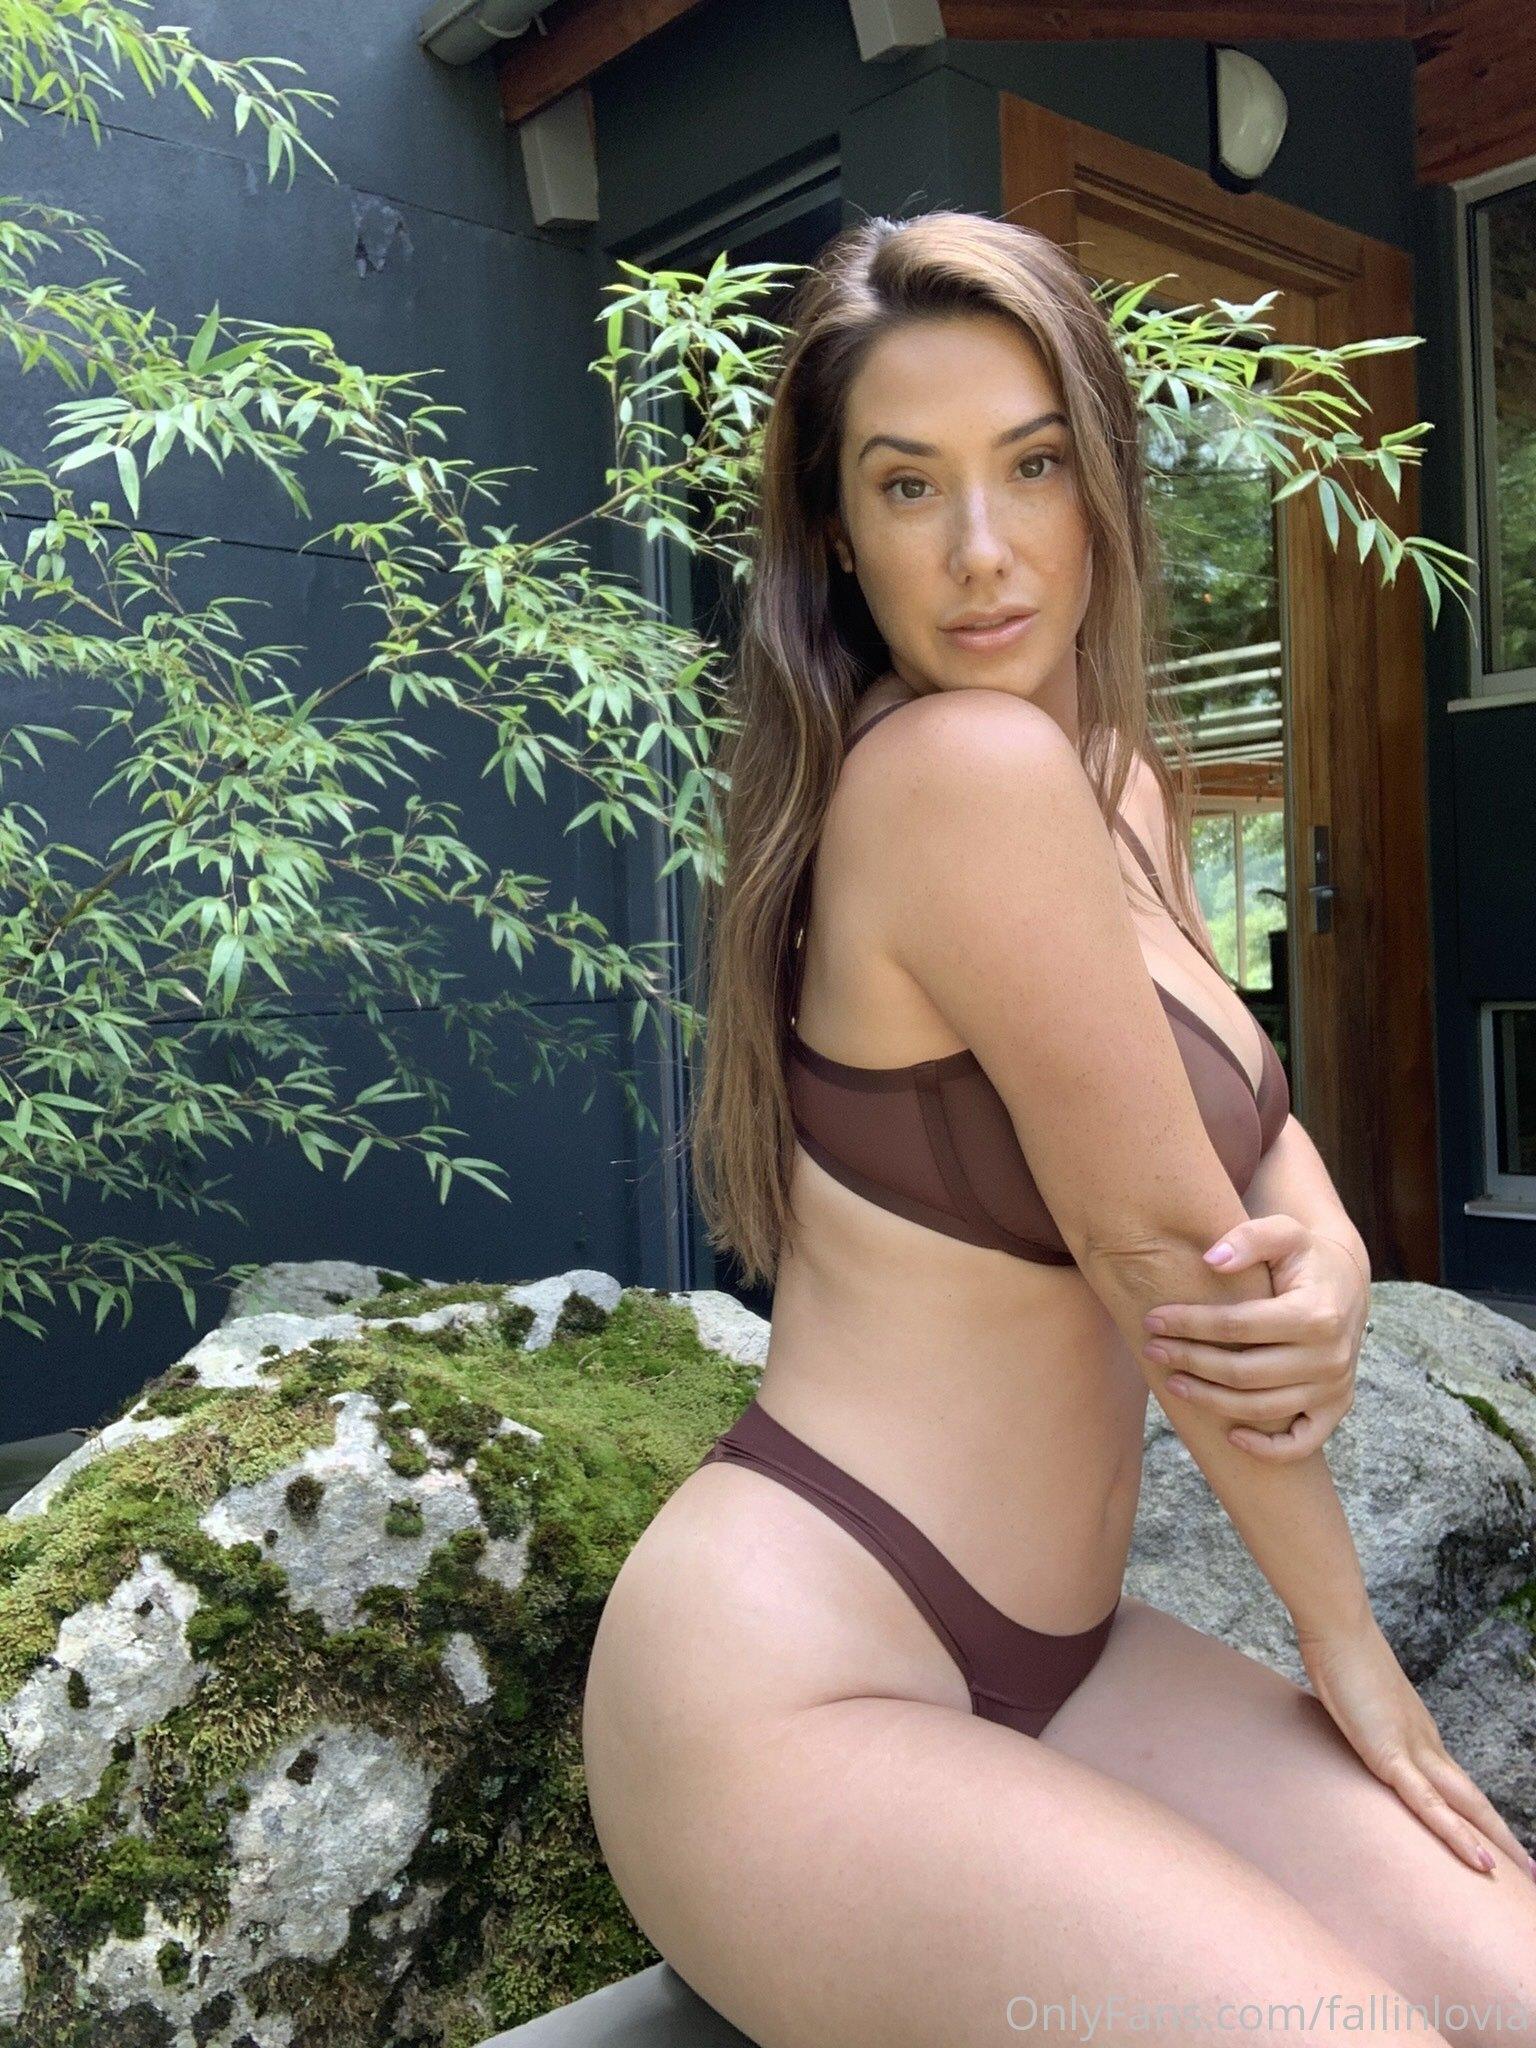 Eva Lovia, Fallinlovia, Onlyfans 0170